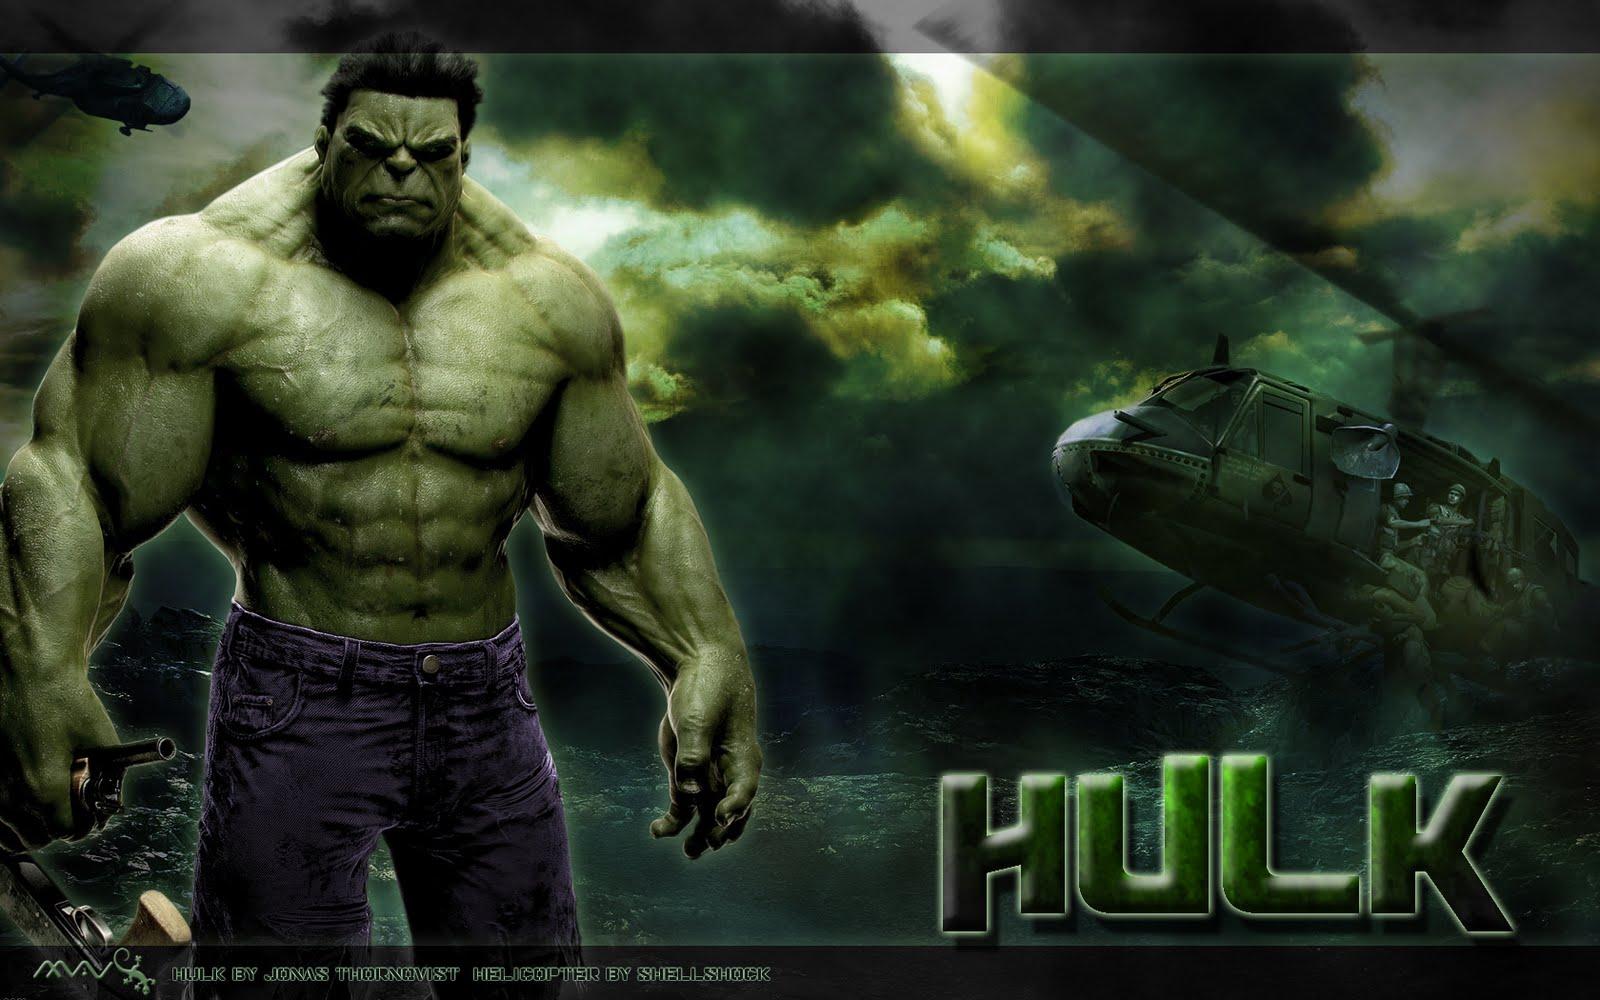 Pin Colleccion Wallpapers E Imagenes Hulk Taringa Ajilbabcom Portal on 1600x1000